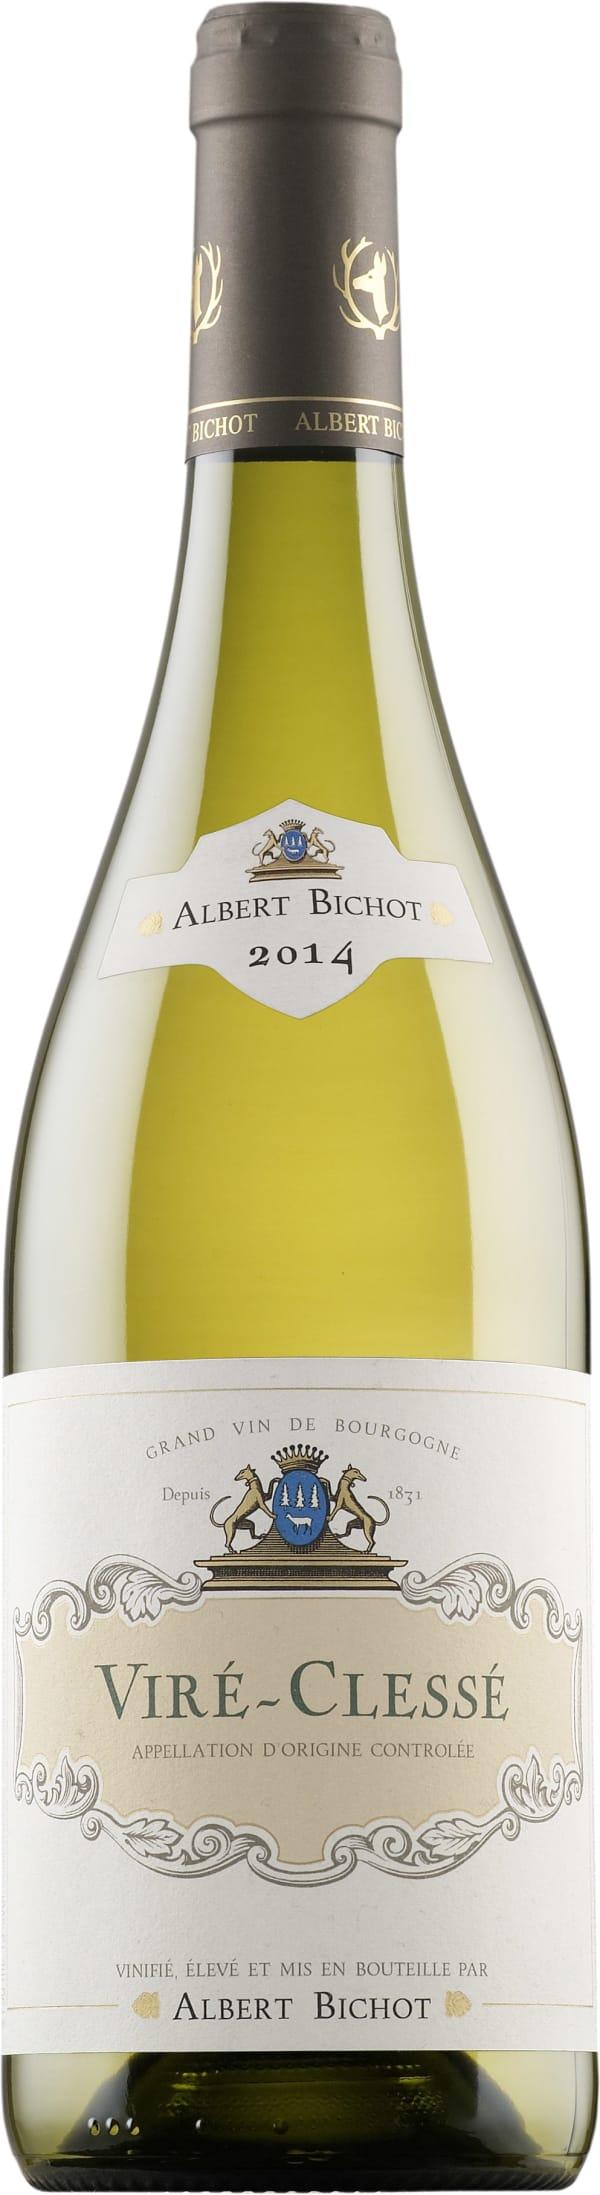 Albert Bichot Viré-Clessé 2014